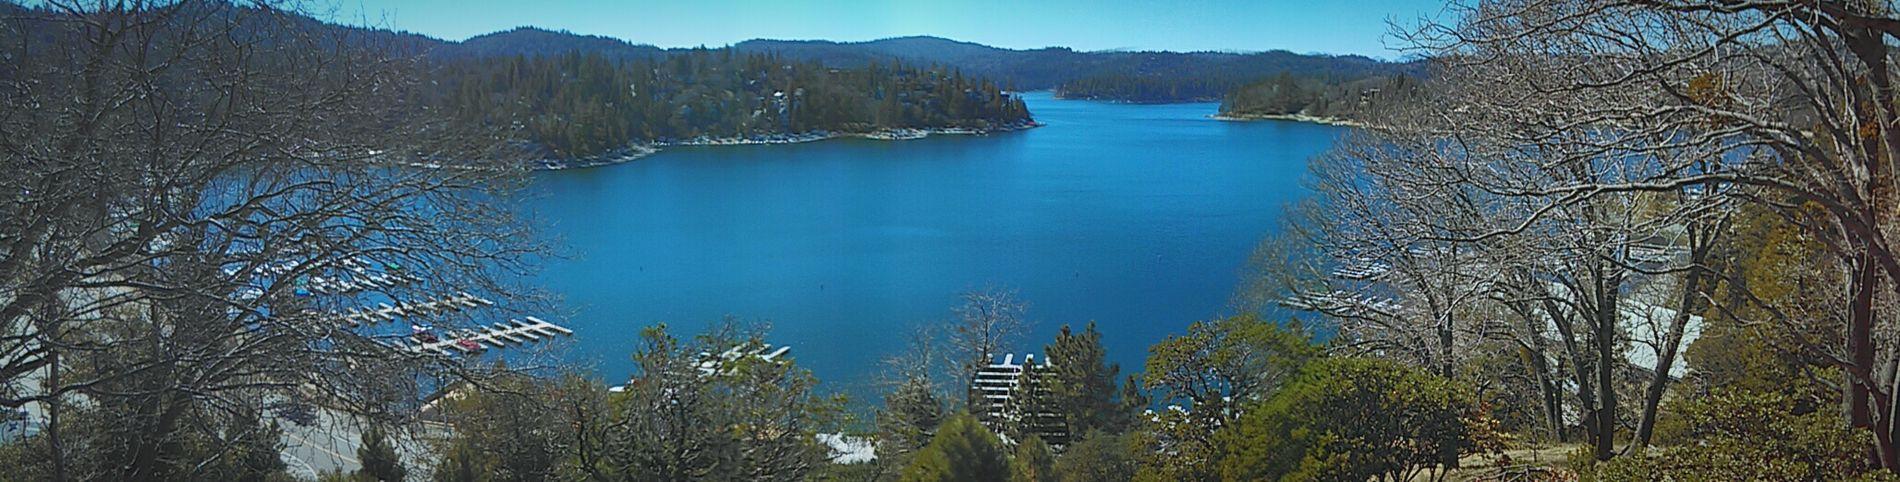 View Lake Nature Simplicity